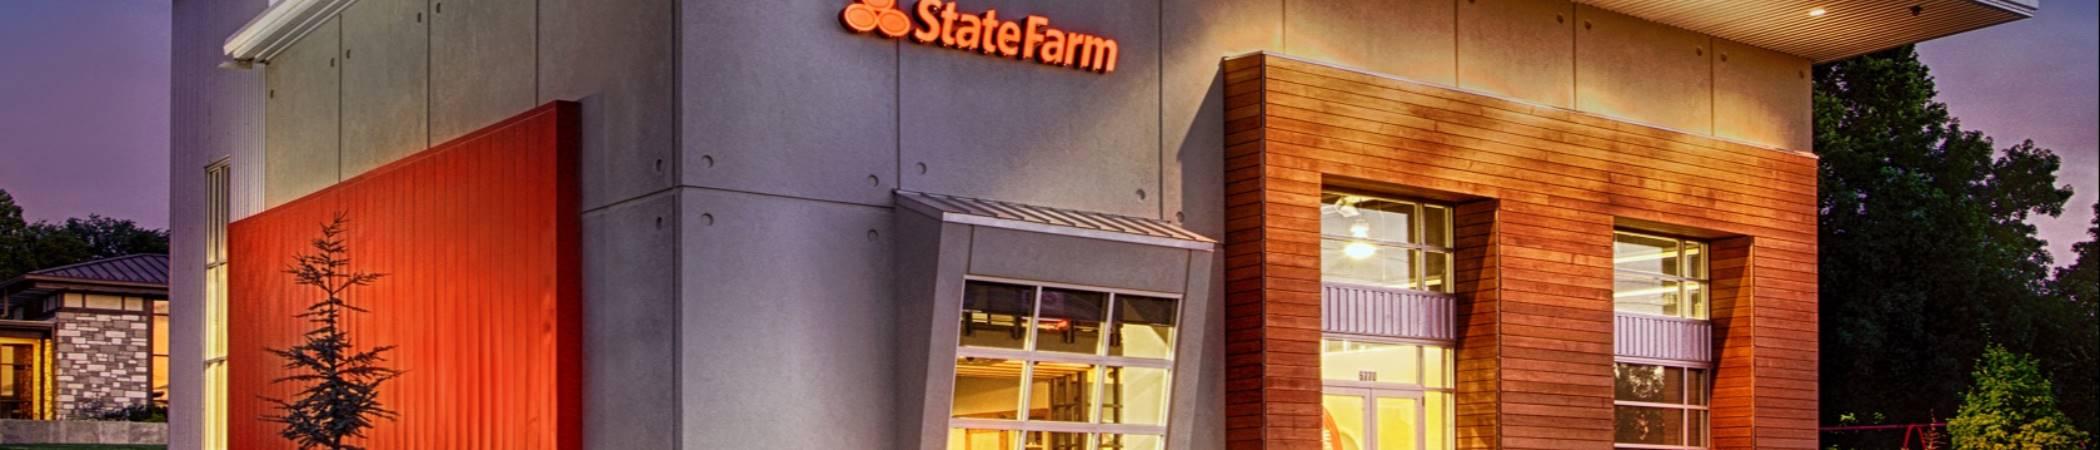 Daniel Parker State Farm | Tulsa Auto Insurance | Homeowners insurance in Tulsa OK